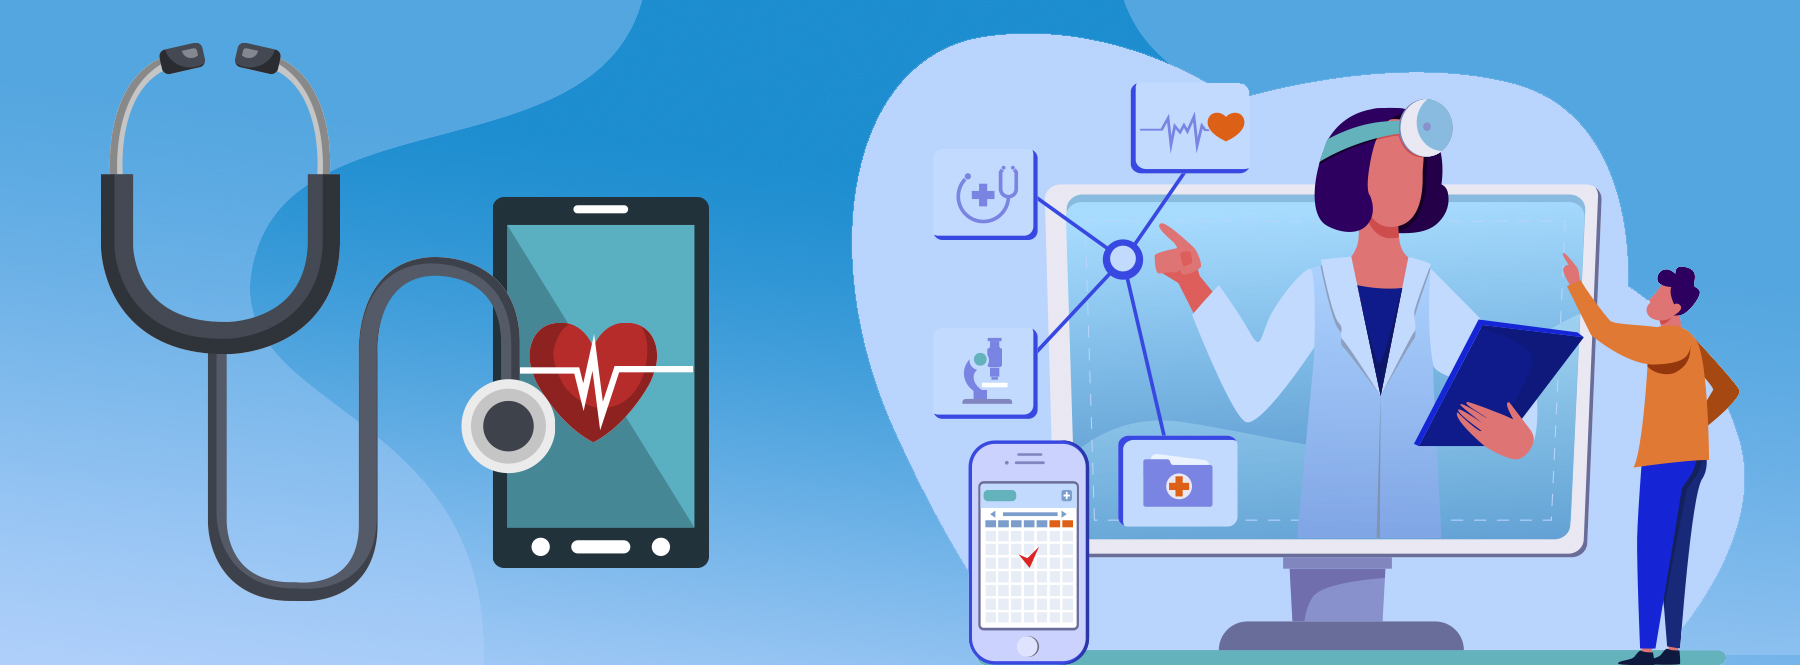 Telemedicina: cómo pedir cita a tu médico online